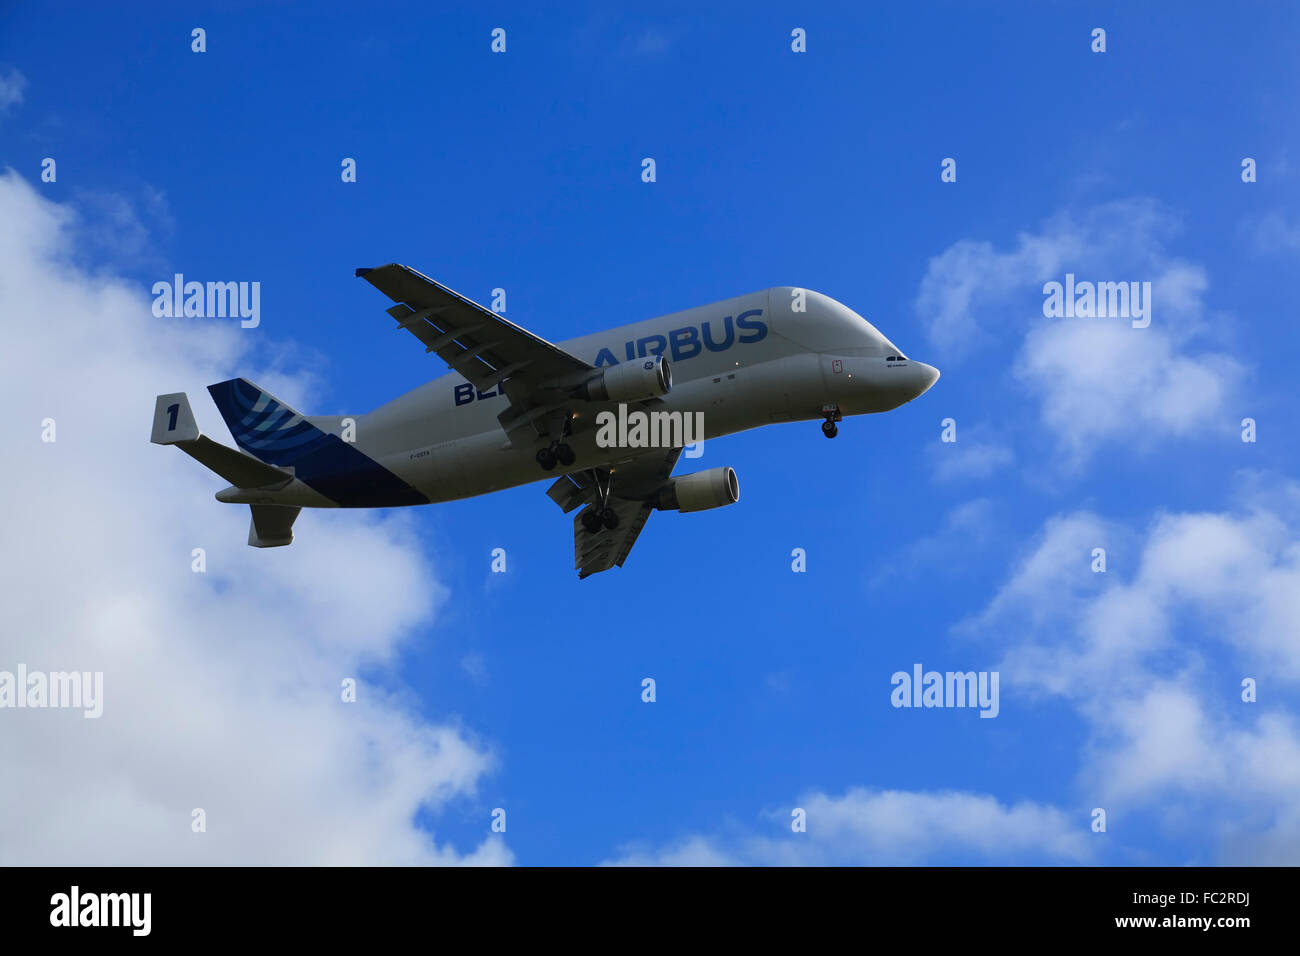 BELUGA Airbus Transpotation Airplane ( A 300-600 ST) Finkenwerder,  Hamburg, Germany, Europe - Stock Image